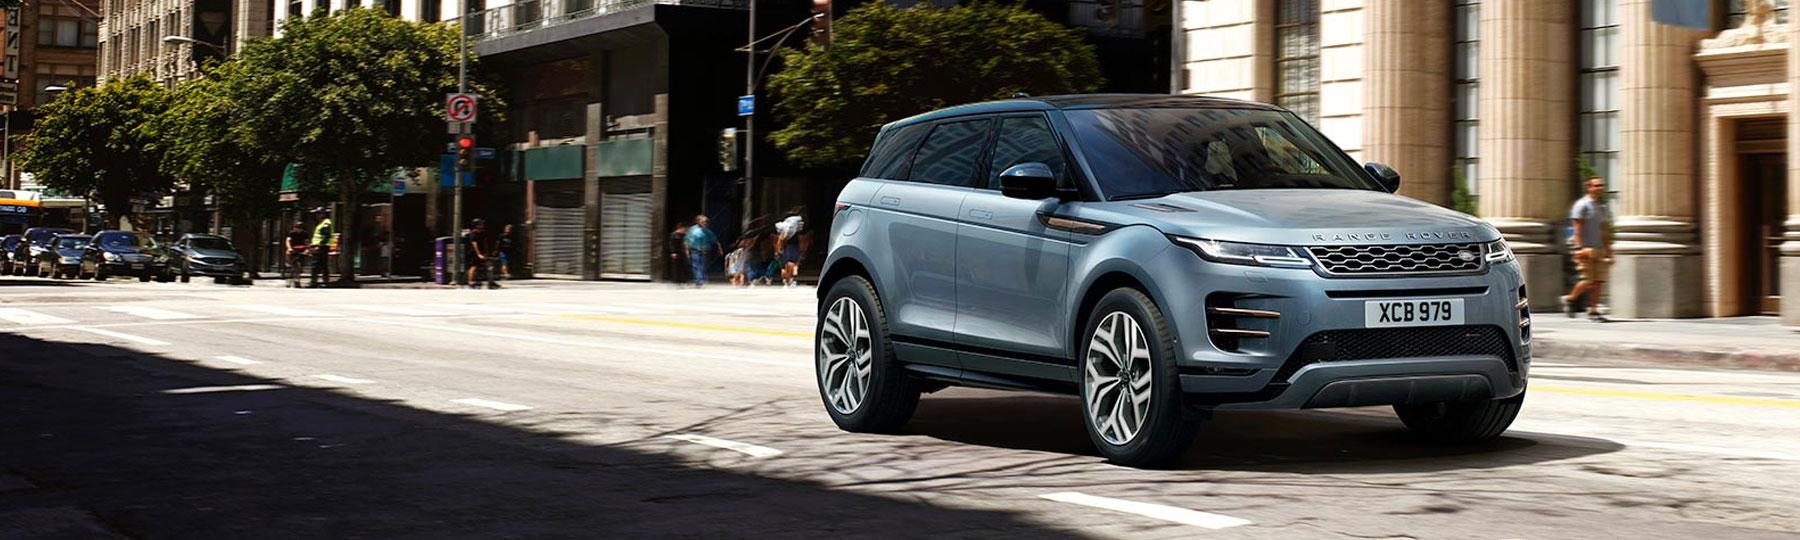 land rover Range Rover Evoque Business Offer